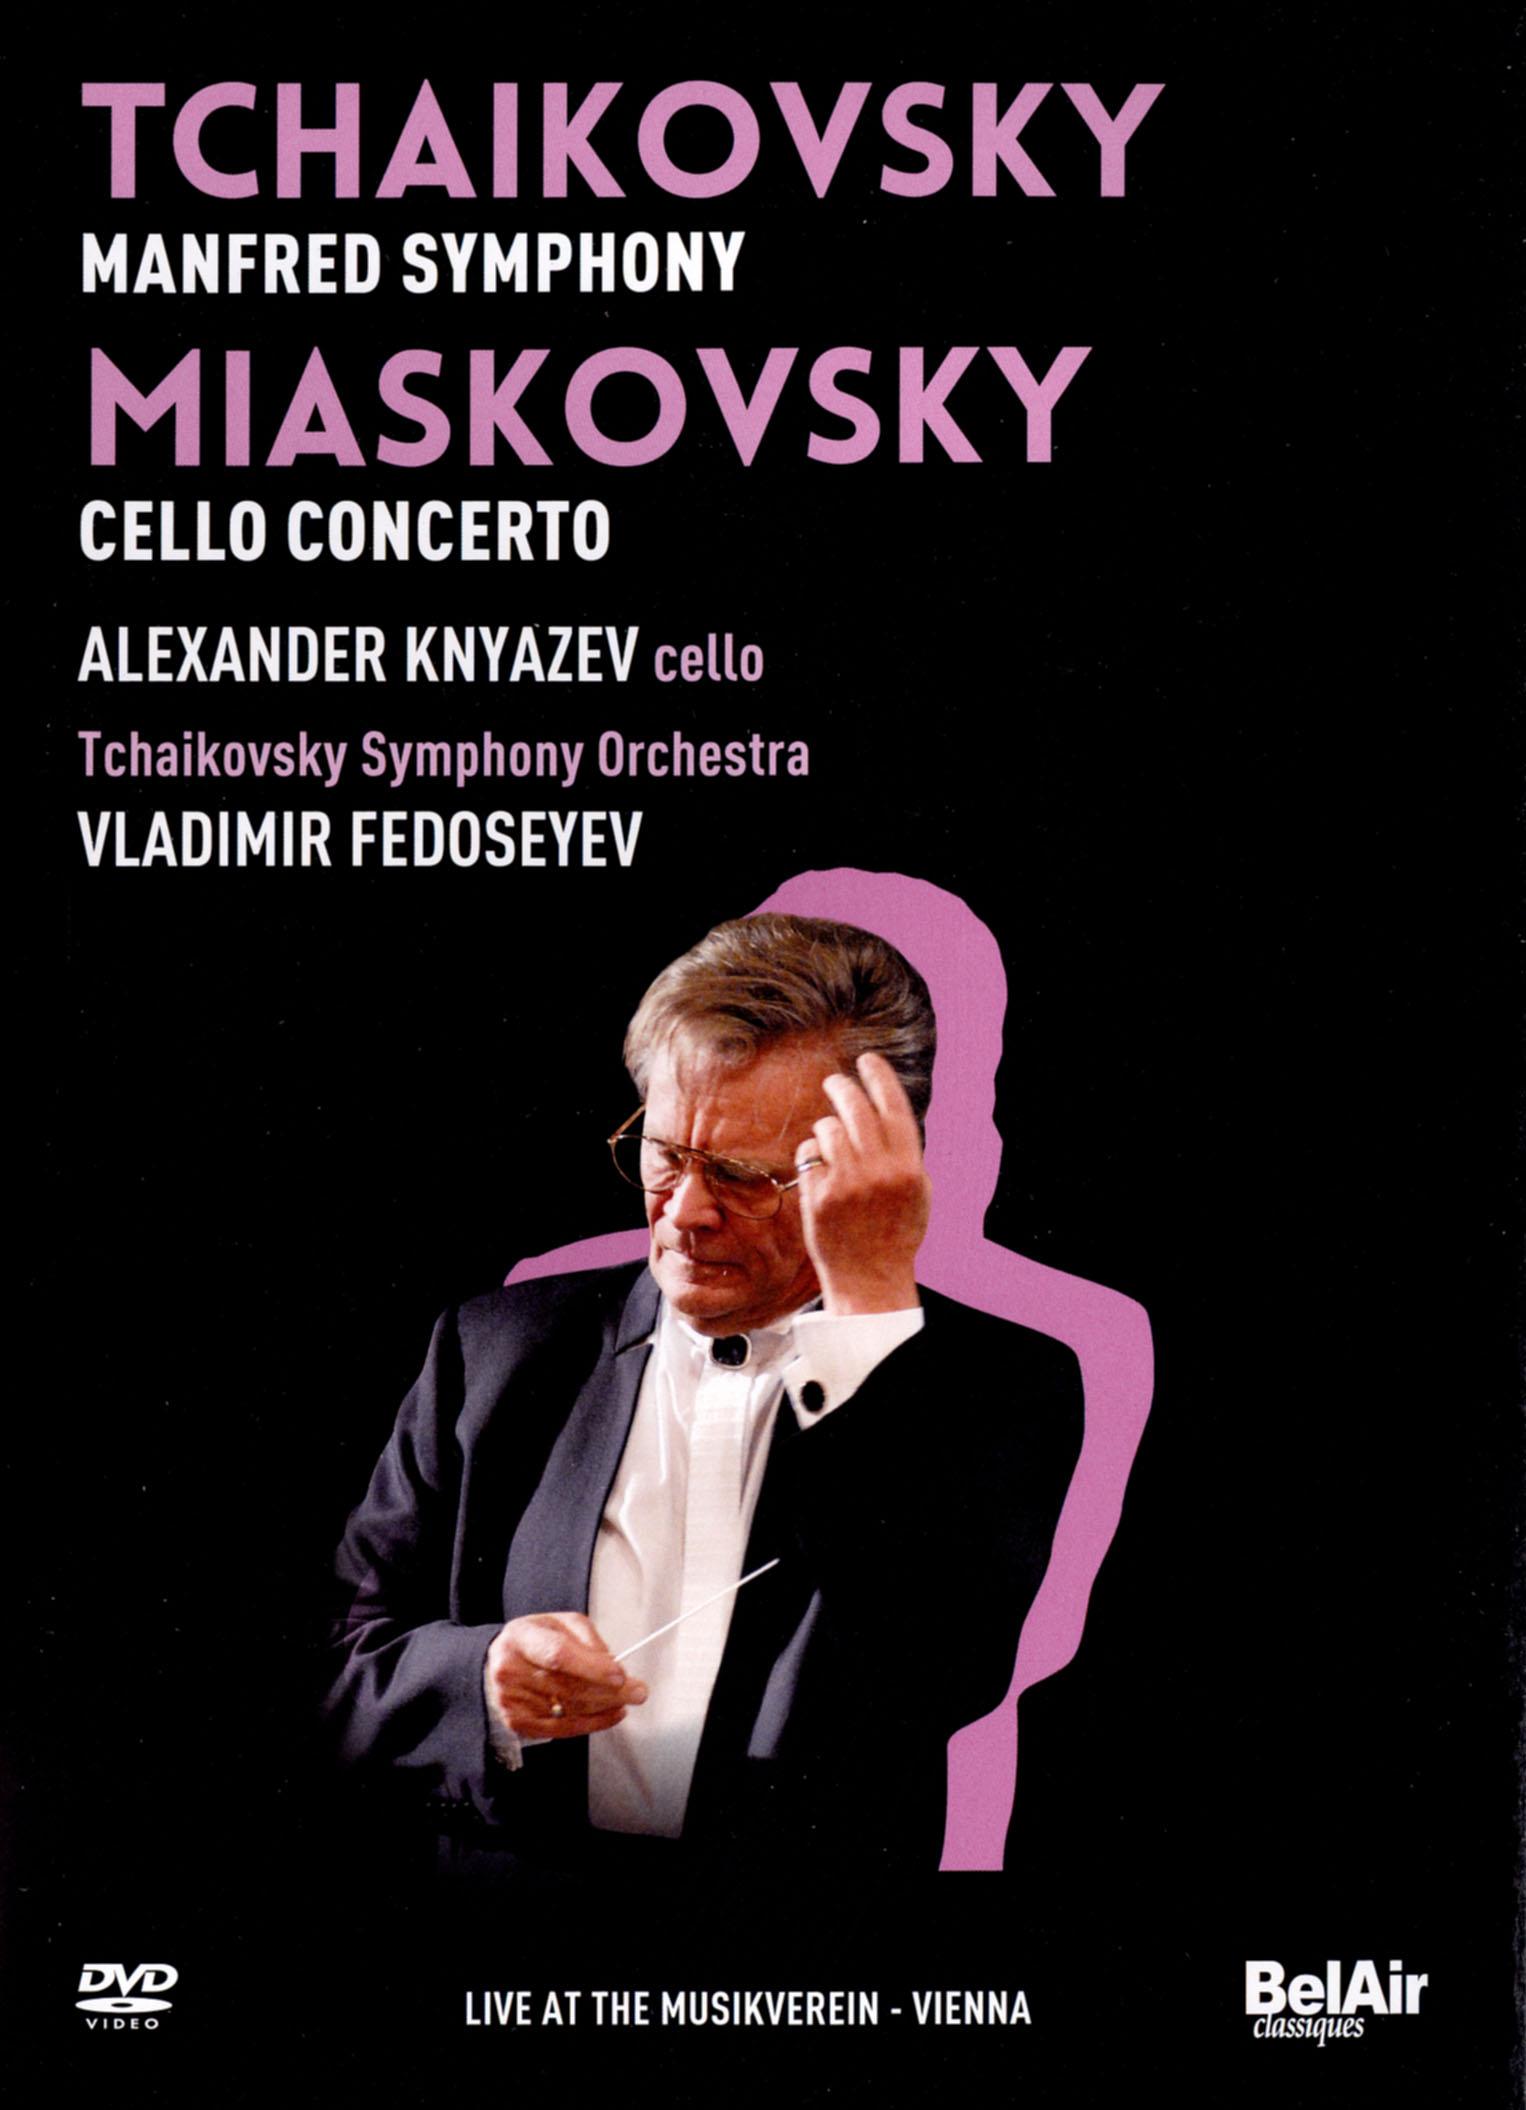 Alexander Knyazev/Tchaikovsky Symphony Orchestra: Tchaikovsky/Miaskovky - Live at the Musikverein, Vi